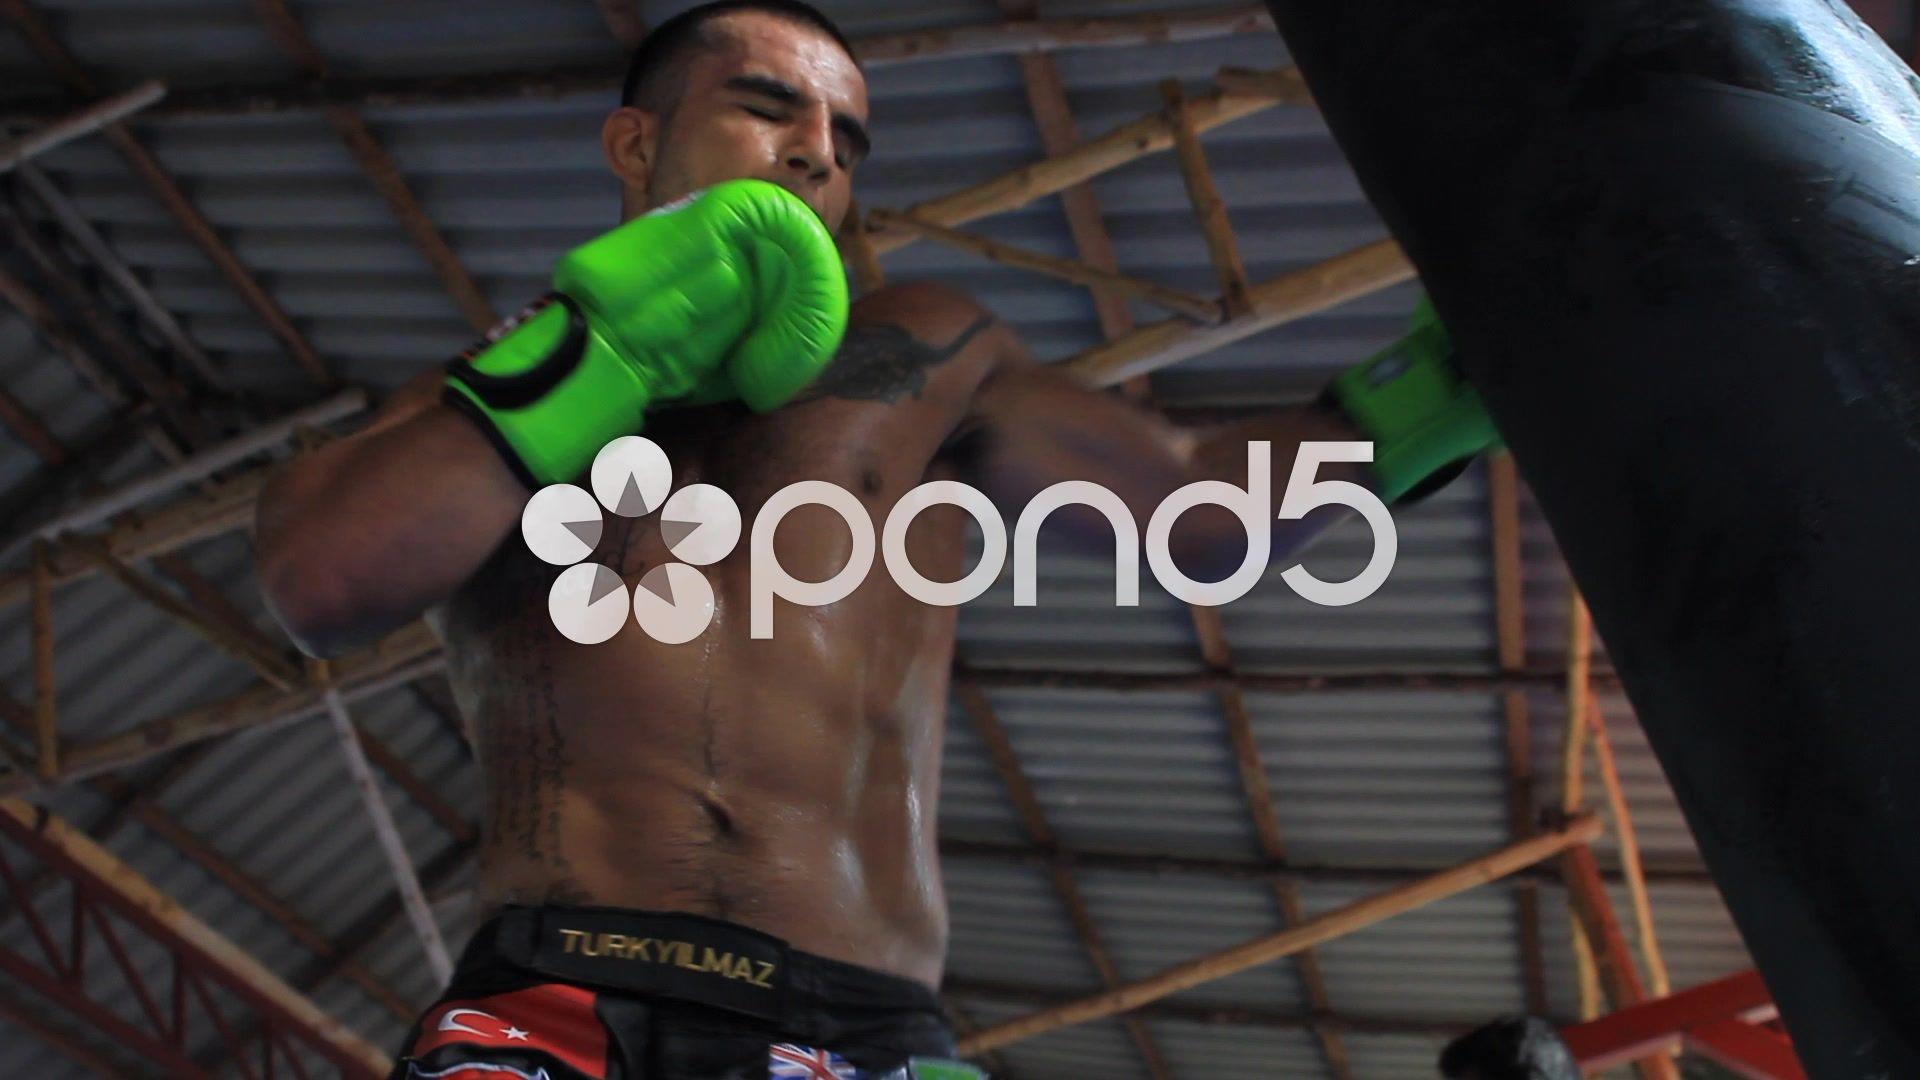 Mma athlete muay thai boxing fight training hitting heavy